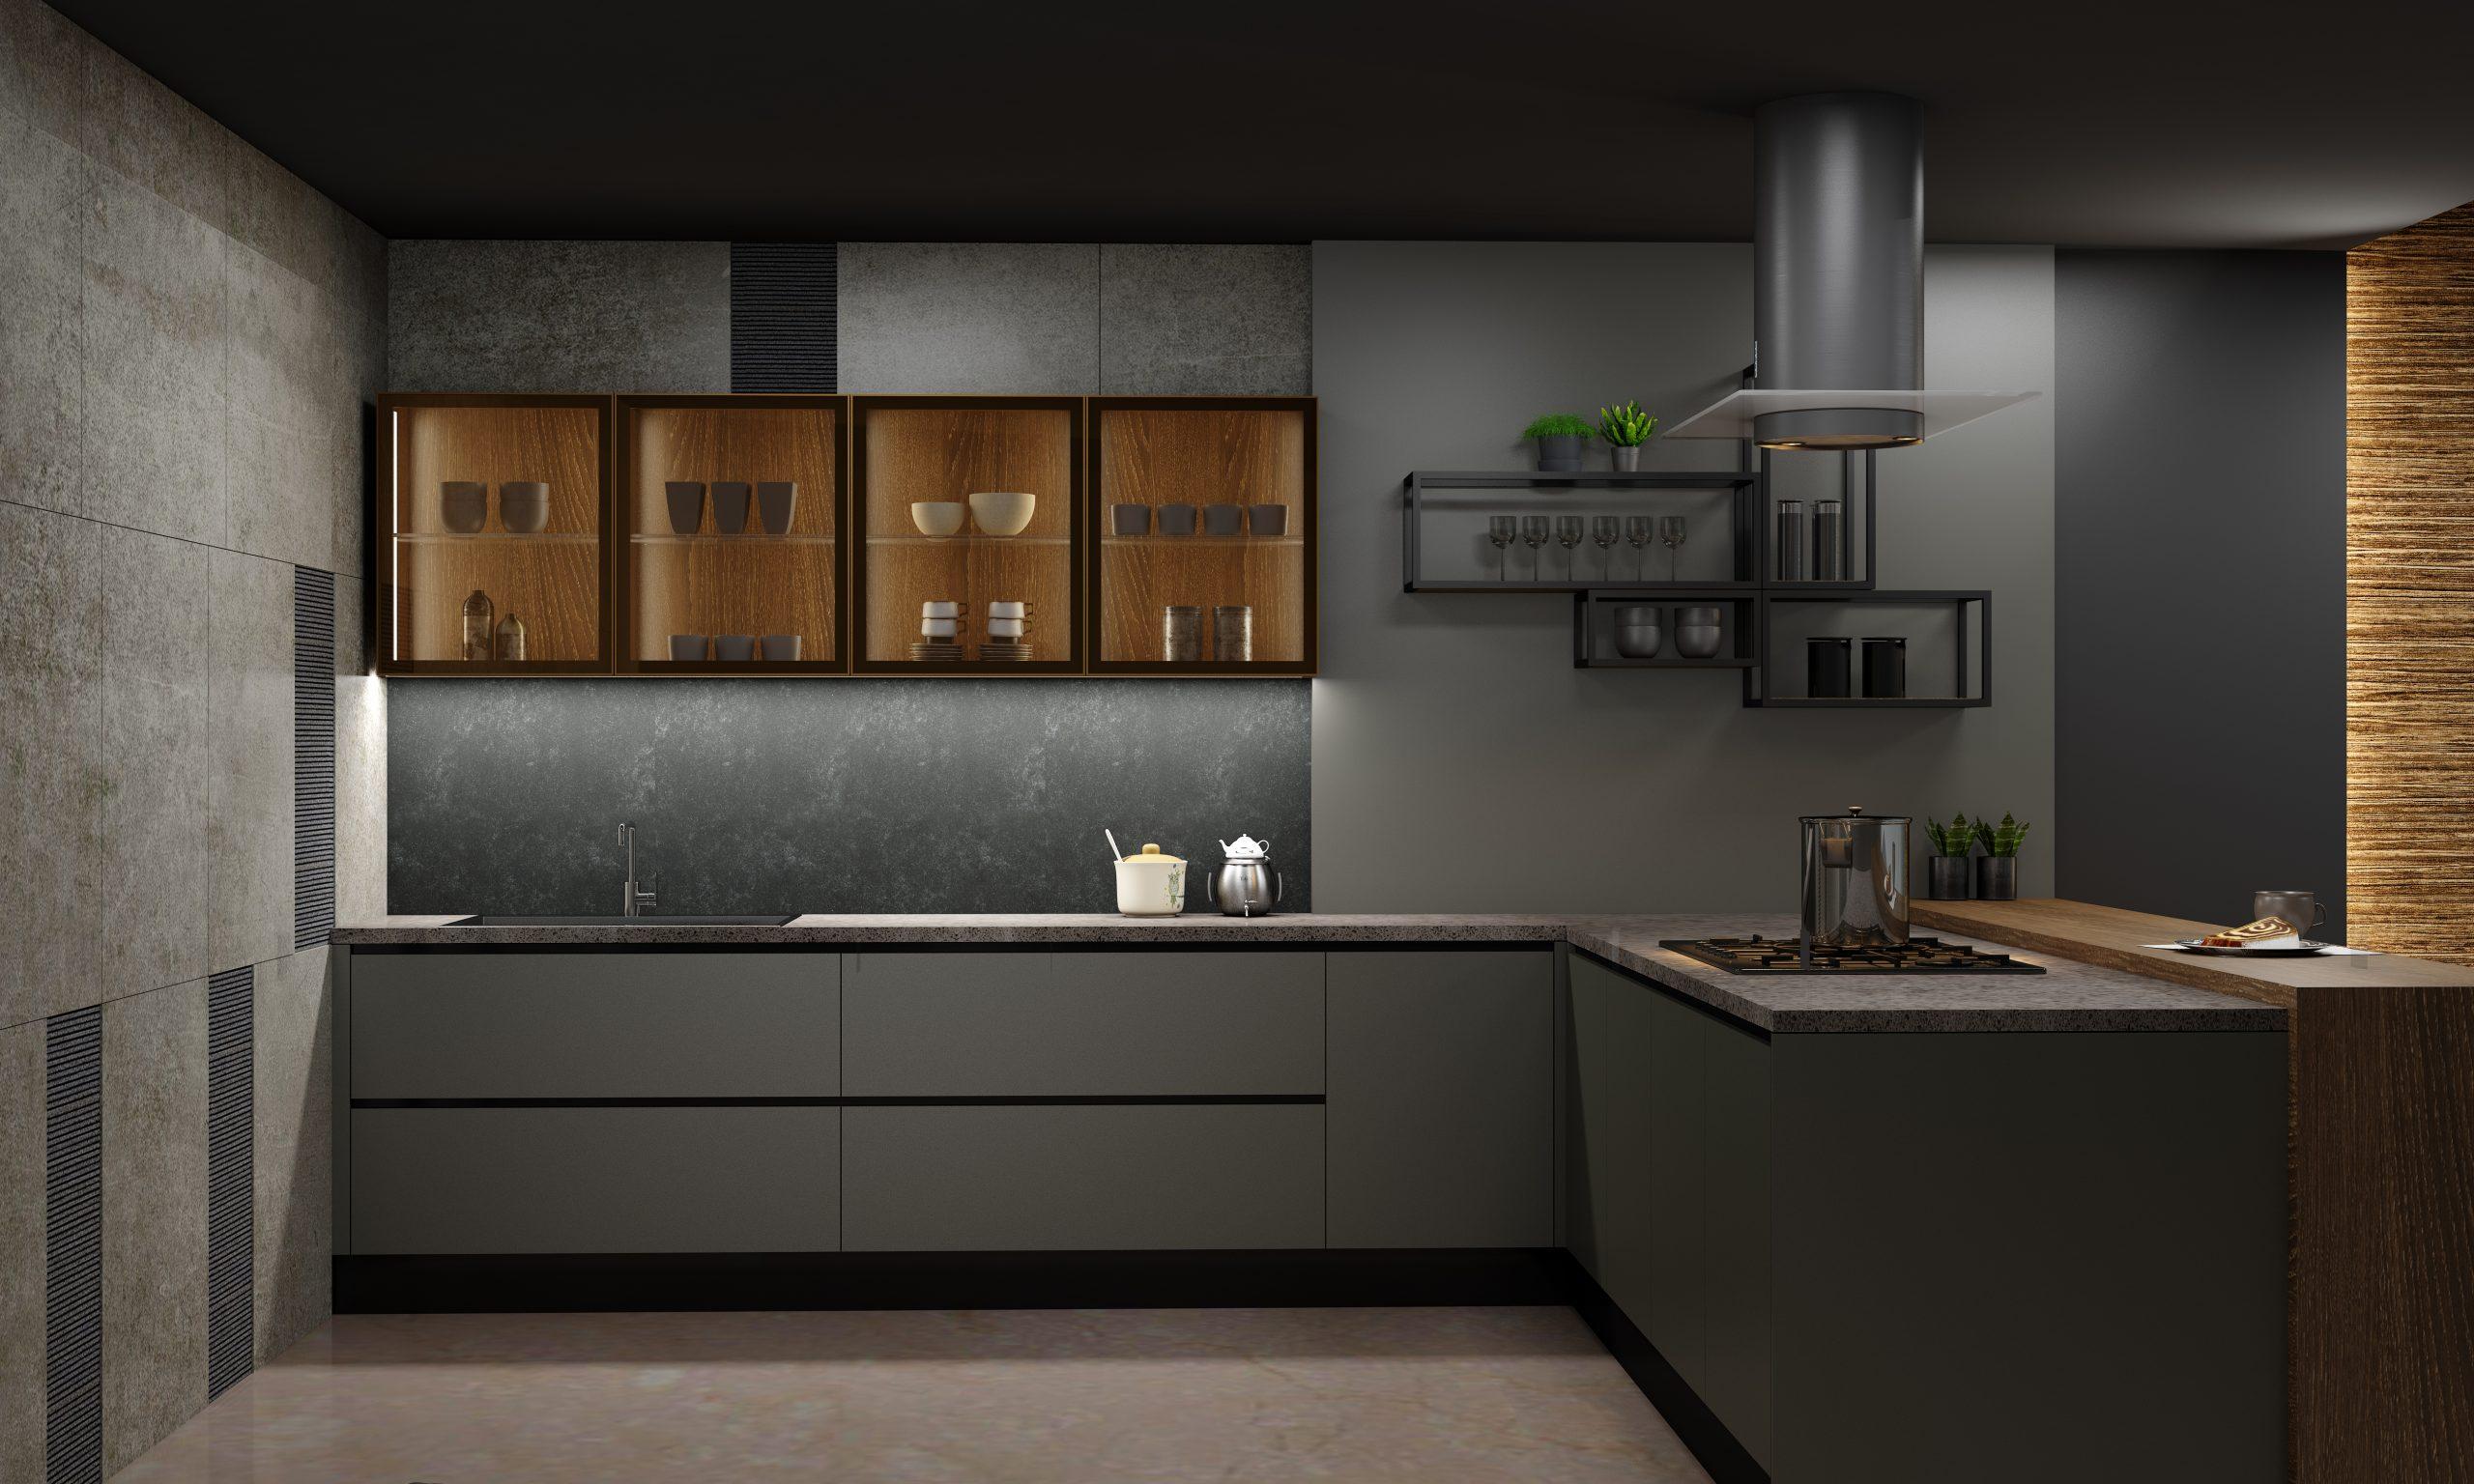 Premiumline Kitchen With Black Handleless Profile in Onxy Dark Grey Matt and Woodgrain Oak Finish